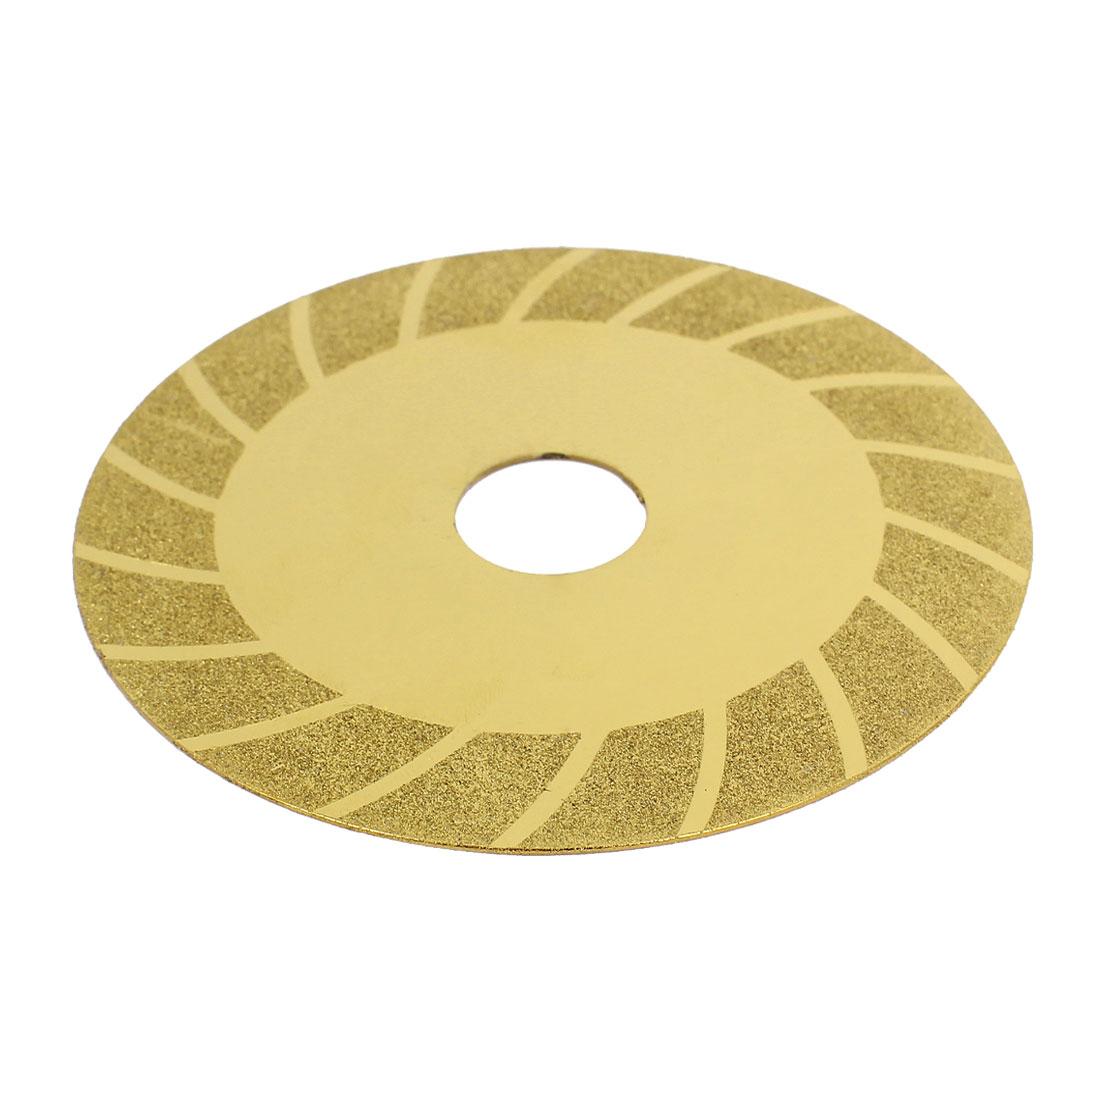 100mmx20mm Concrete Tile Diamond Grinding Polishing Wheel Cutting Disc Gold Tone